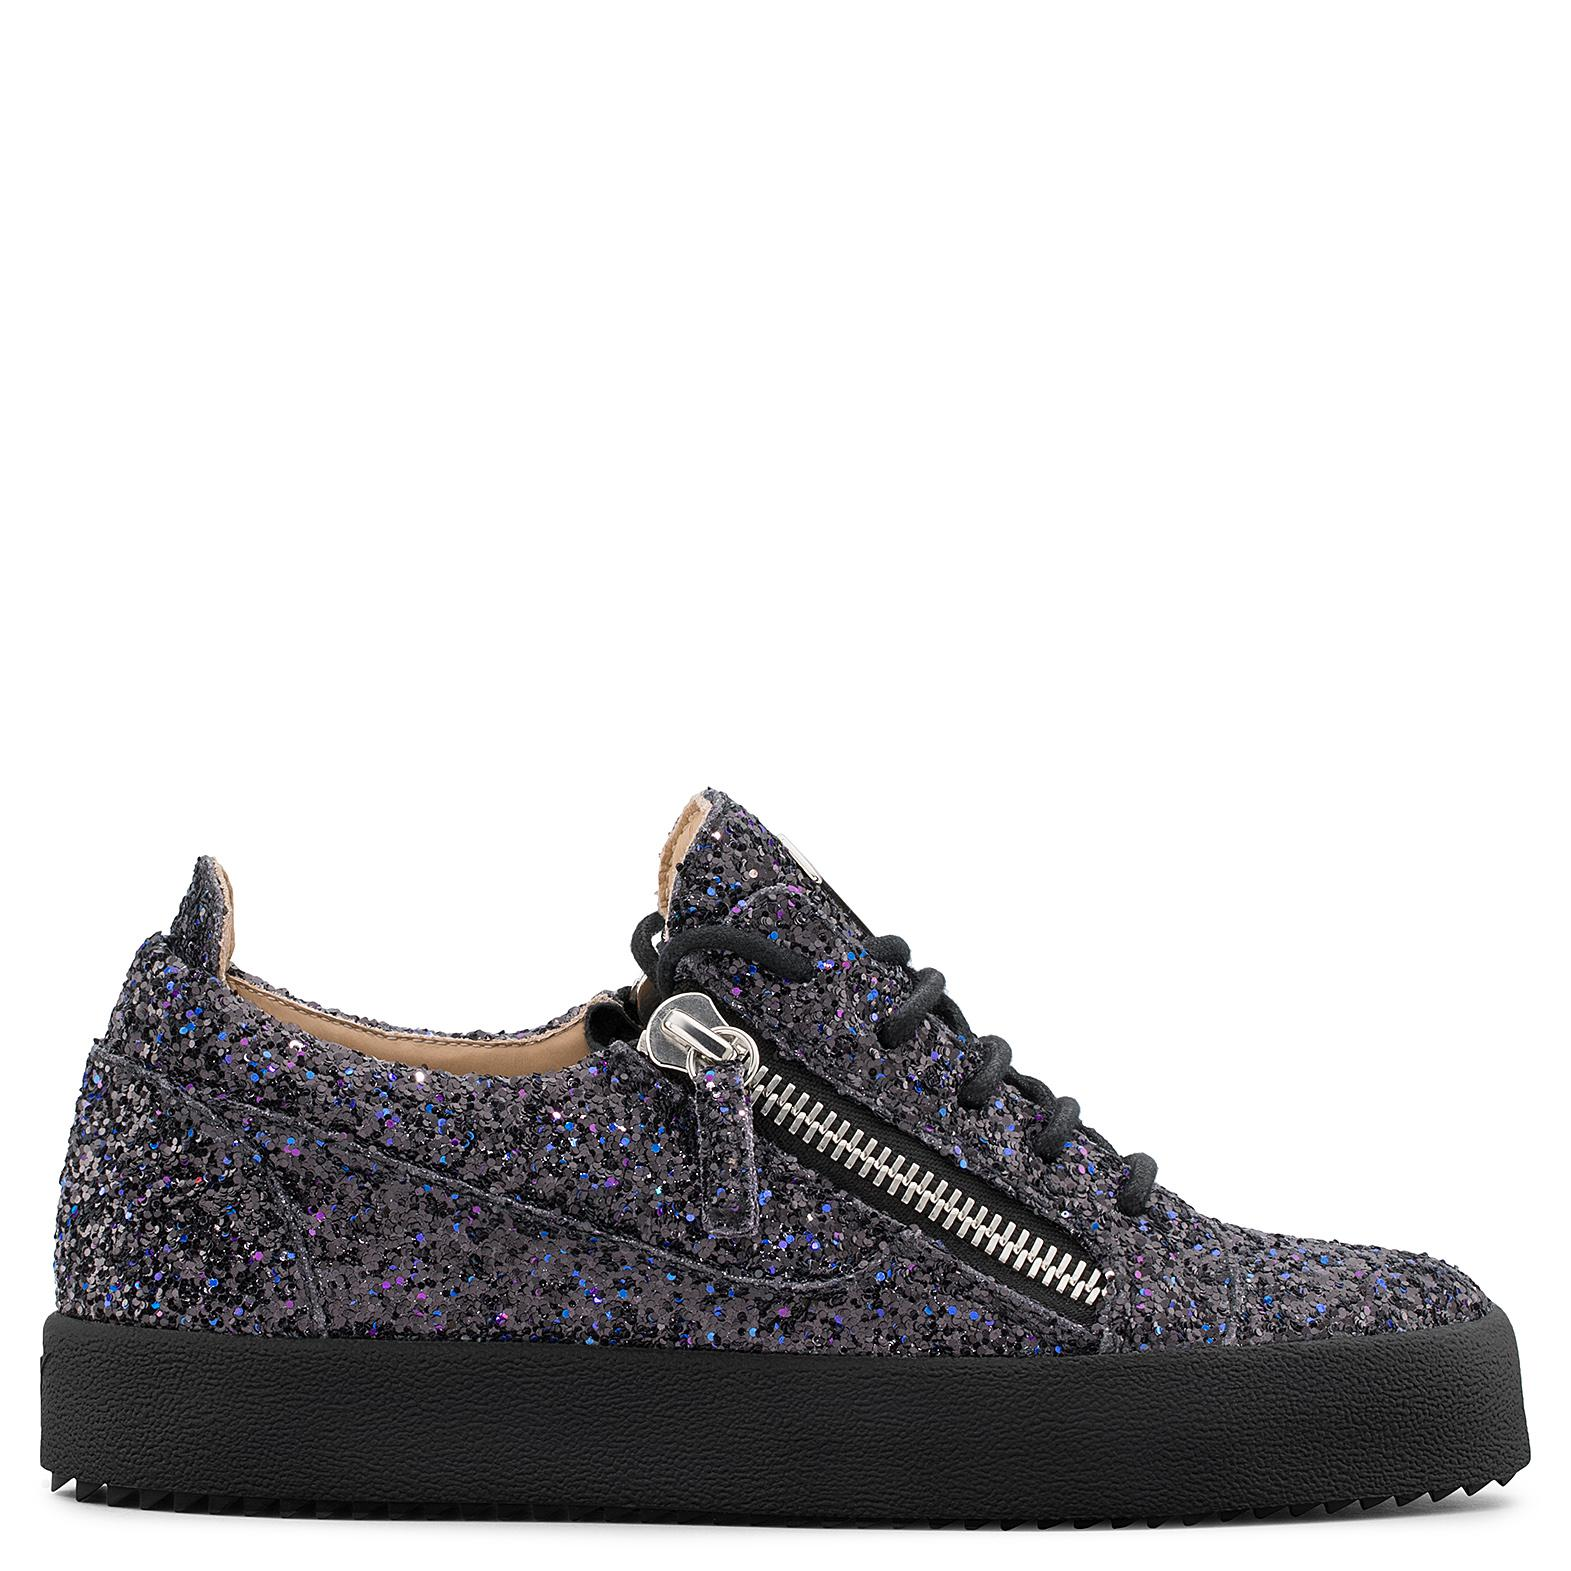 Giuseppe Zanotti Multicolour printed fabric low-top sneaker GAIL wvXZLket6